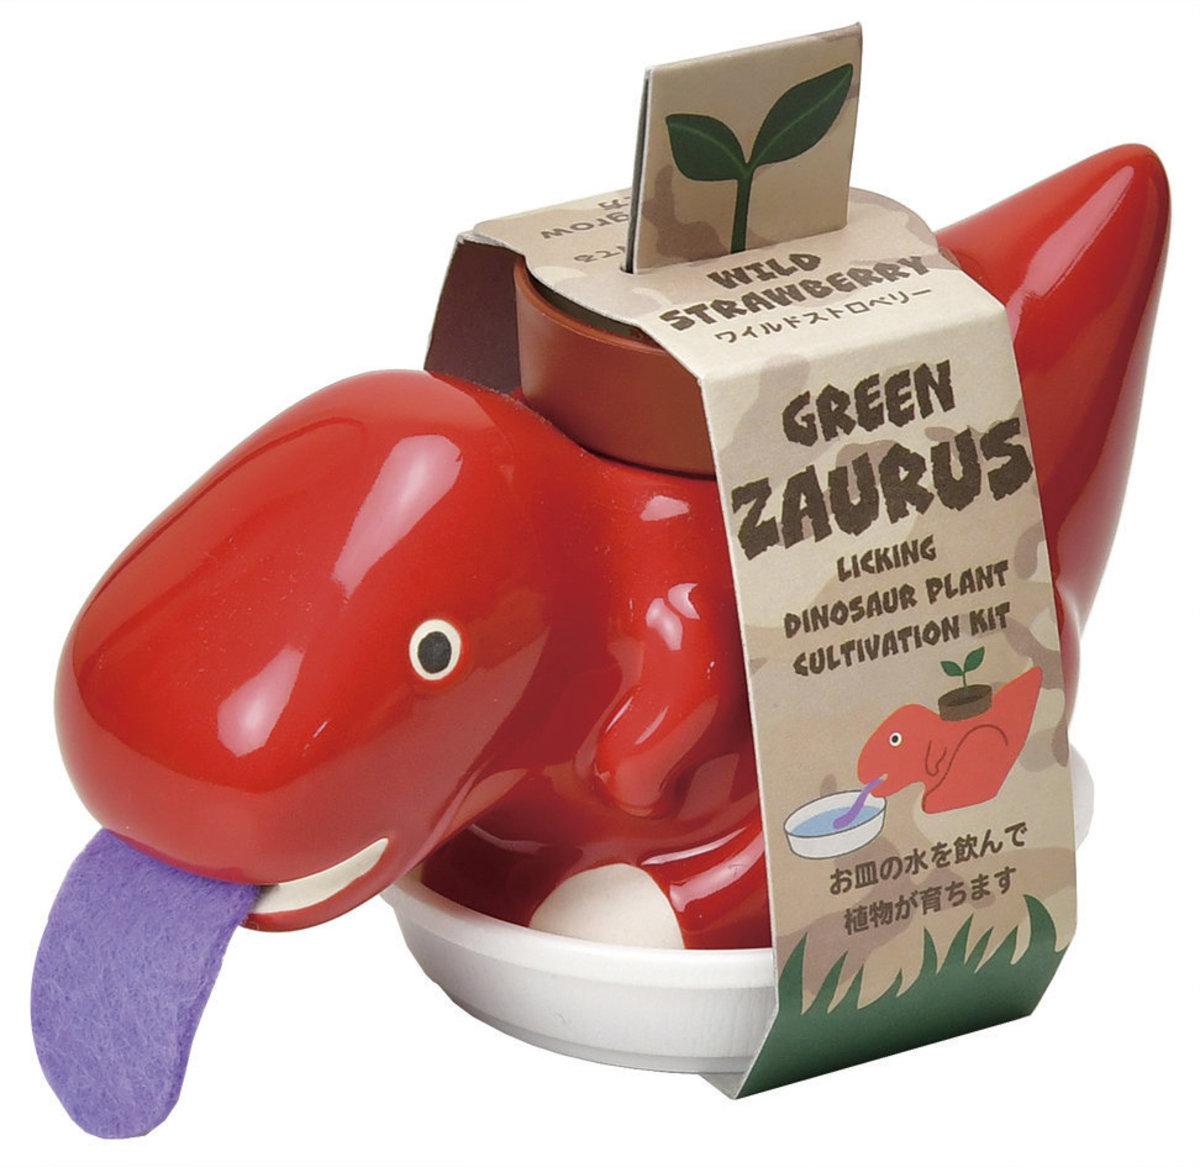 GD-893-03 Green ZAURUS - Red (Wild Strawberry)